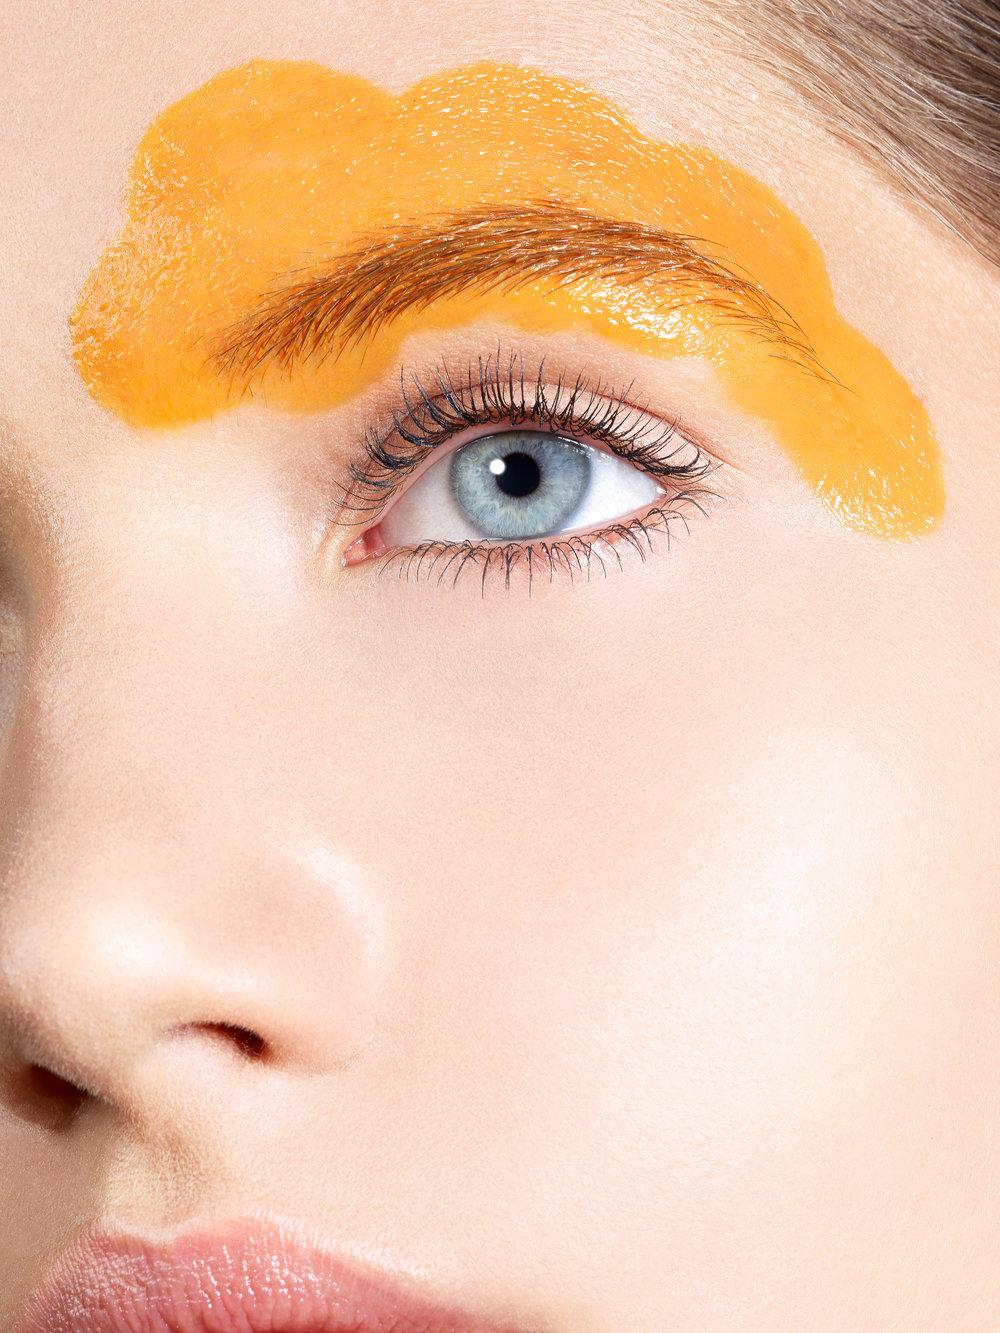 eyebrow-makeup-eye-paint-inspiration-stan-musilek-photography